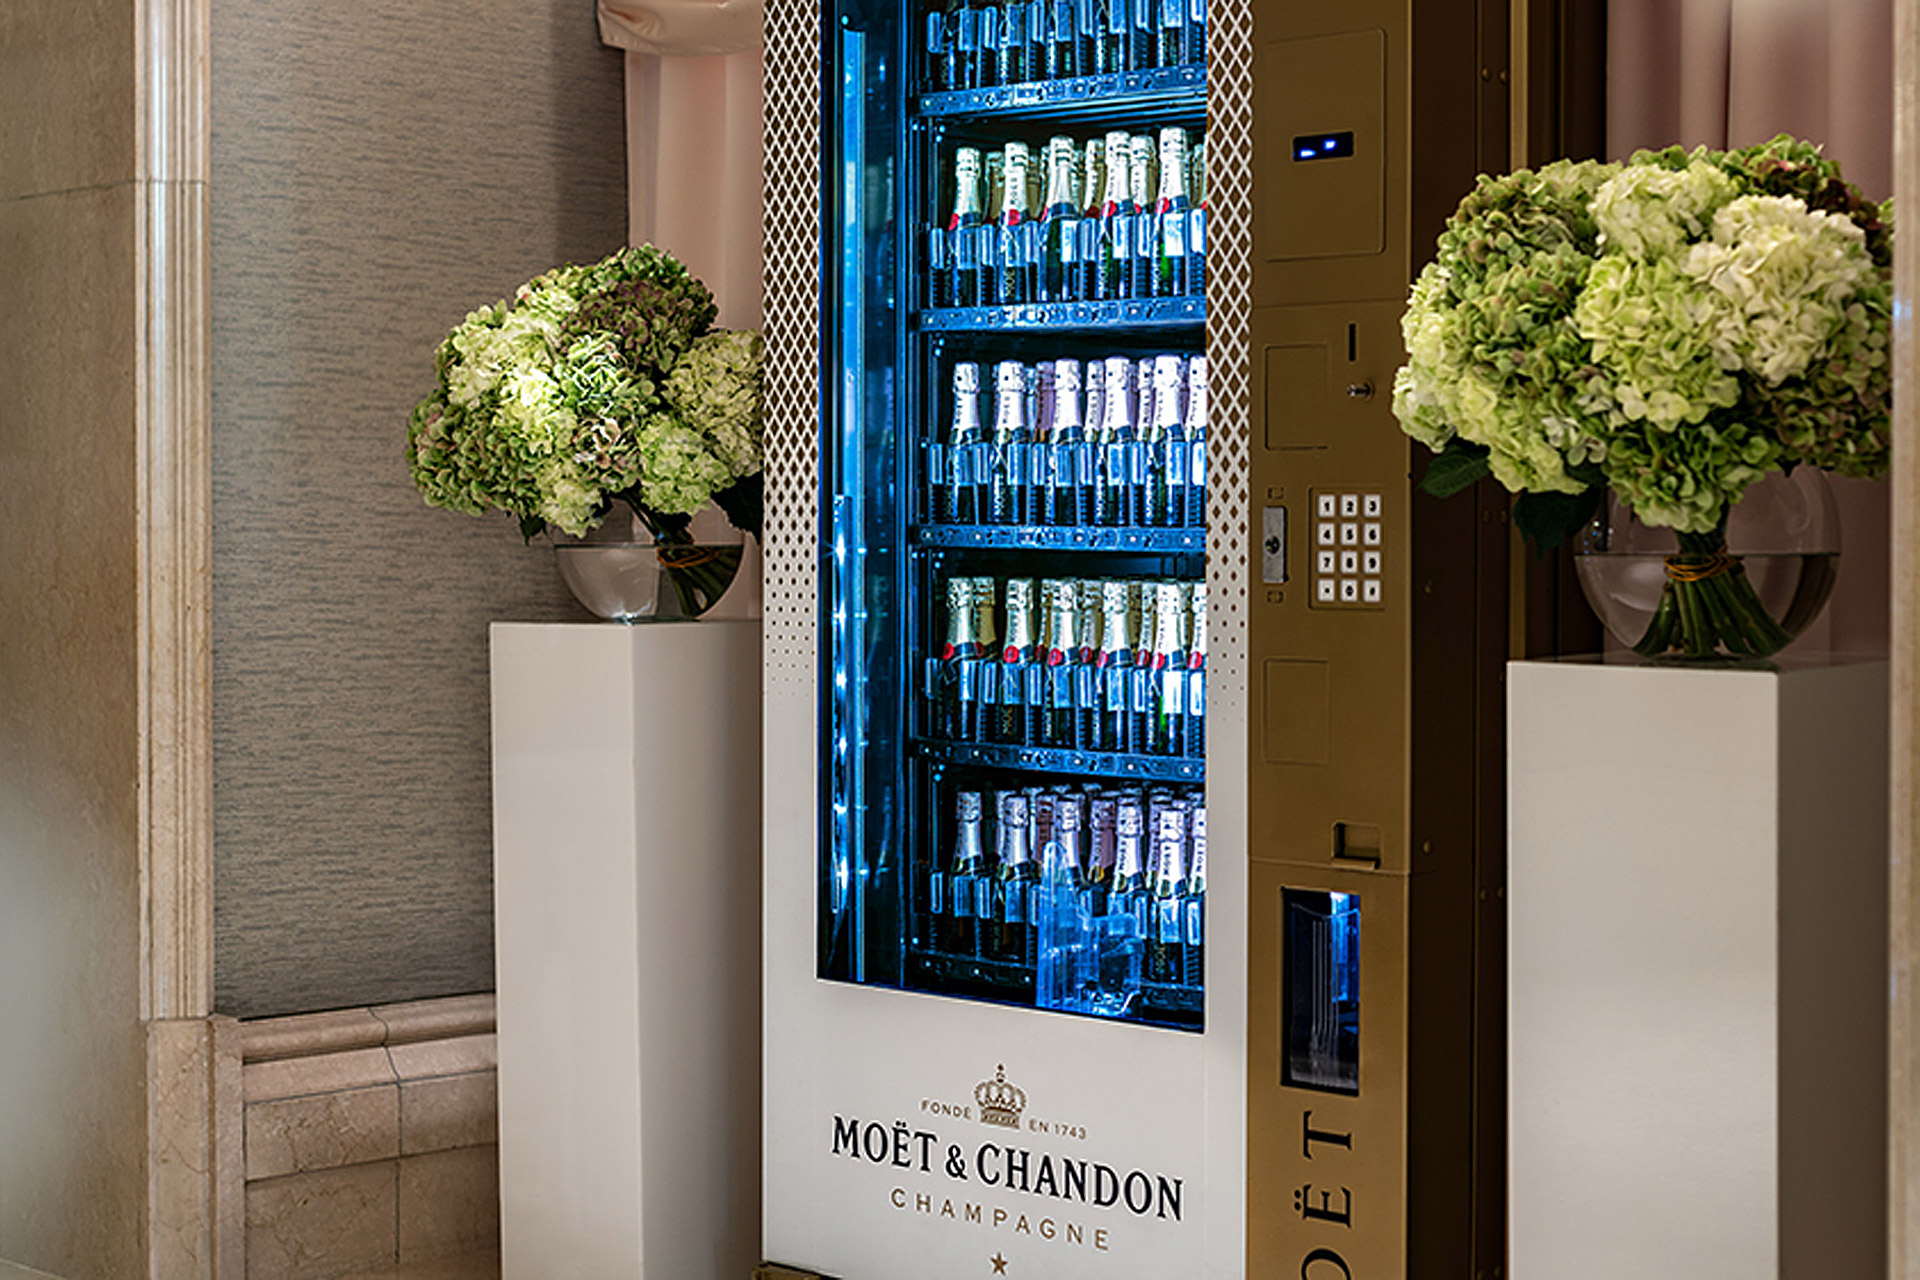 Ritz-Carlton Champagne Vending Machine